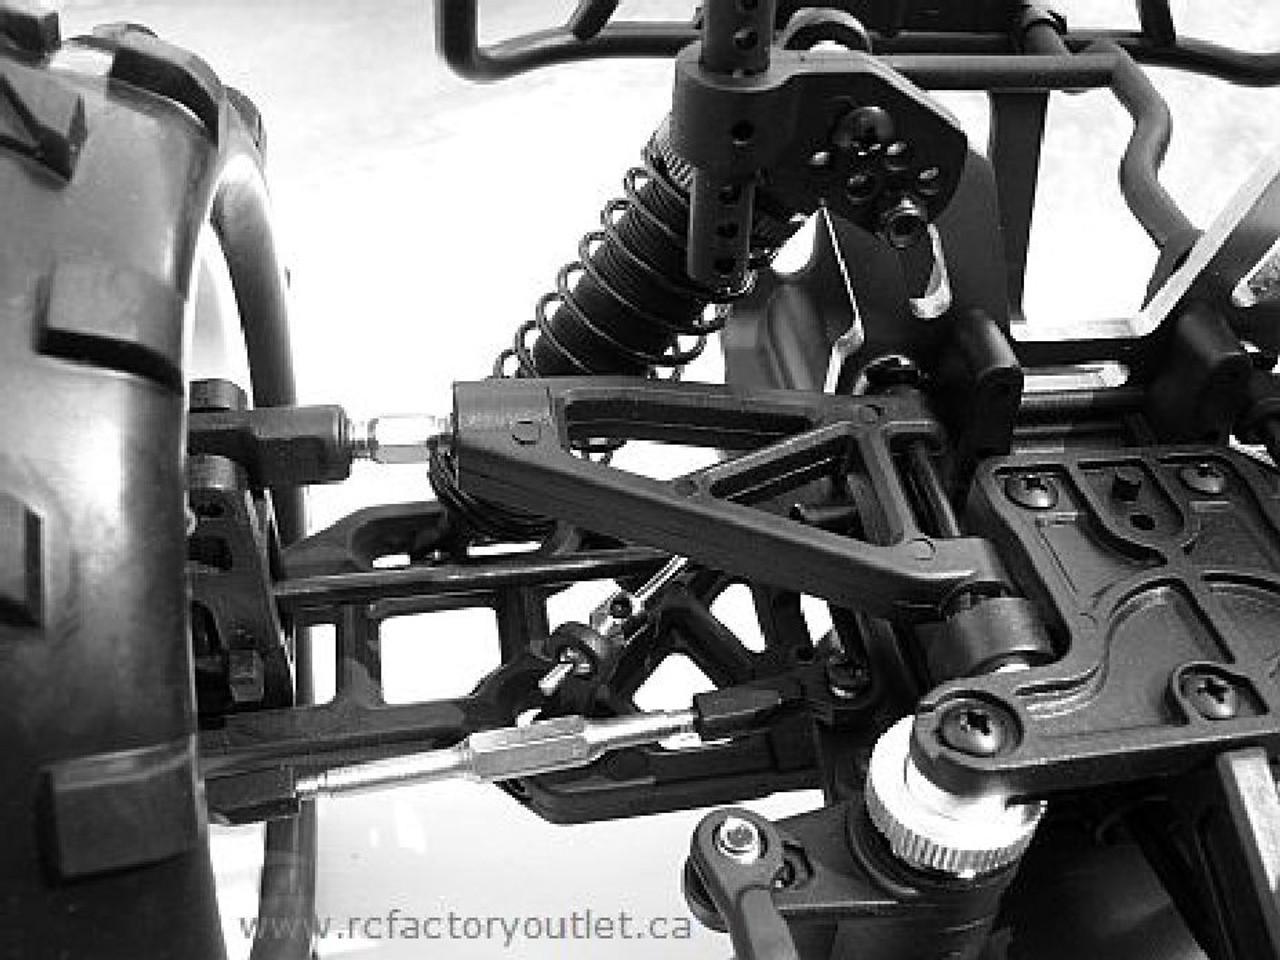 RC Nitro Truck 1/8 Scale  Radio Control Nokier 3.5cc  4WD 2 Speed 2.4G 08327